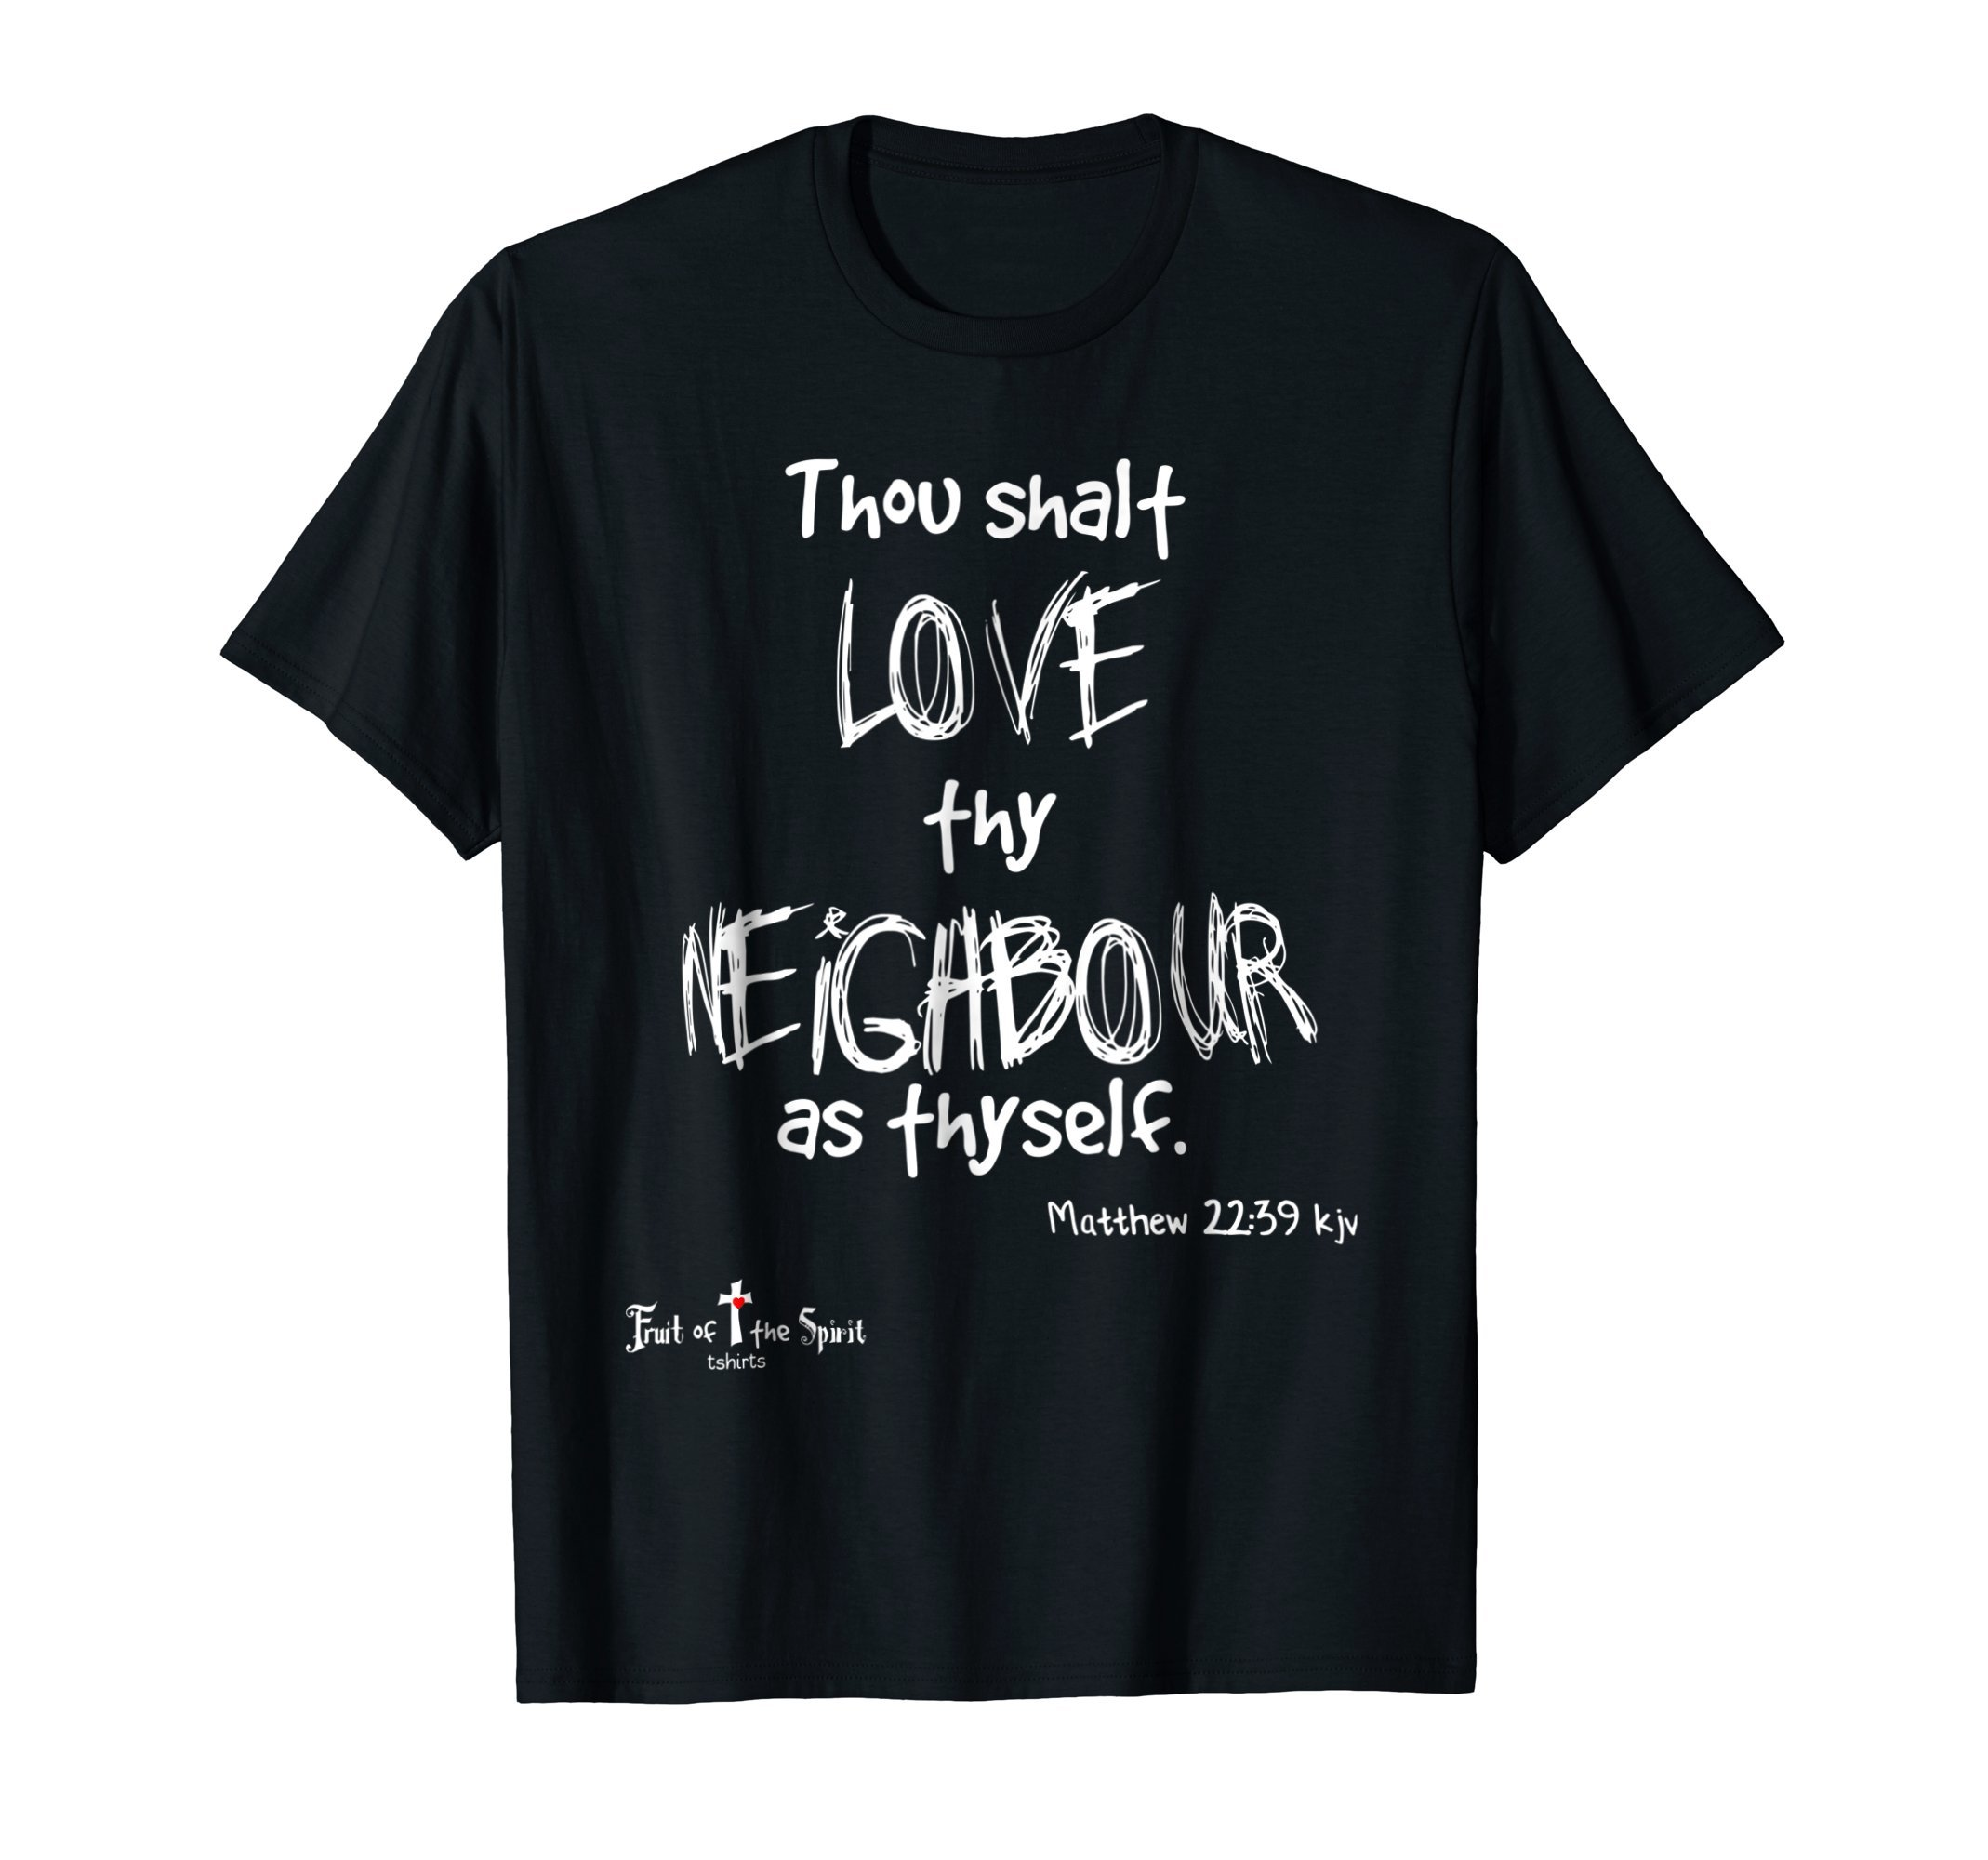 Thou shalt love thy neighbour as thyself Mat 22:39 Christian